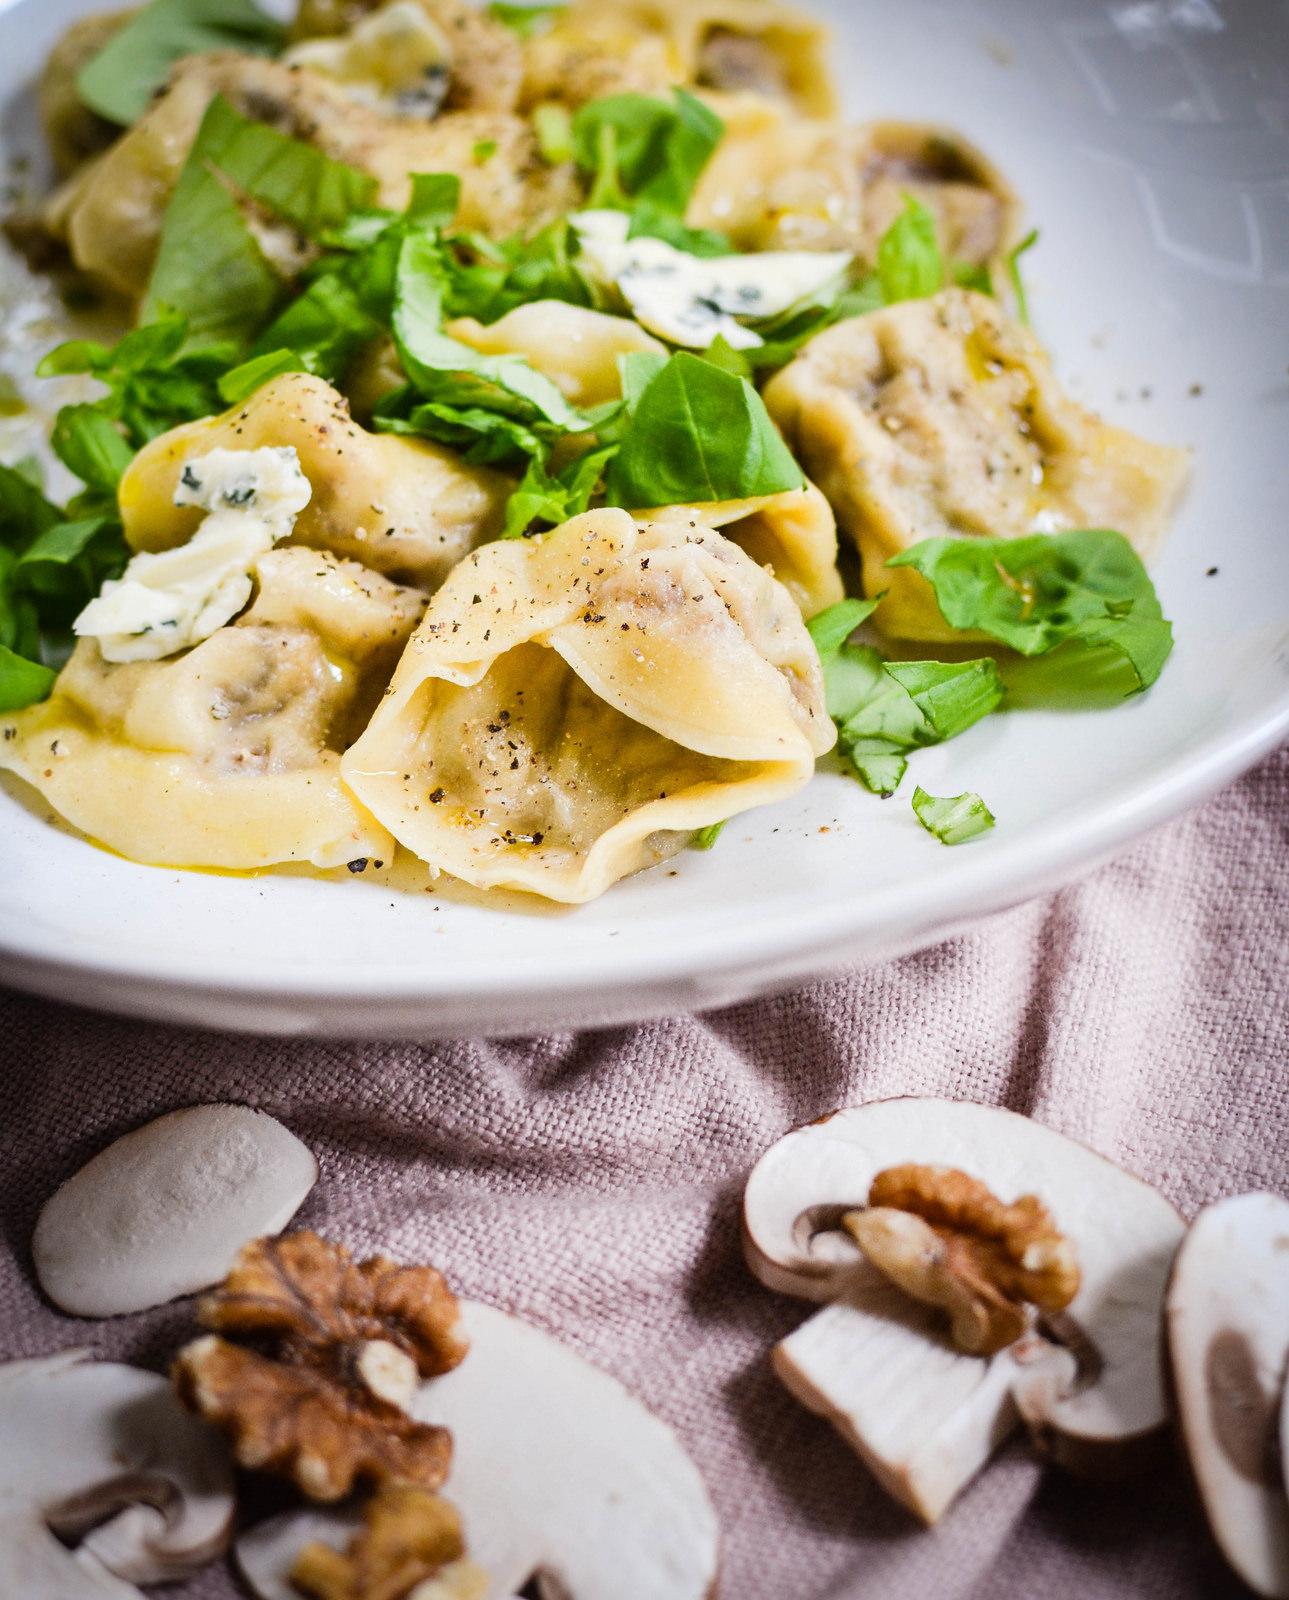 Castello Creamy Blue Tortellini with Mushrooms and Walnuts